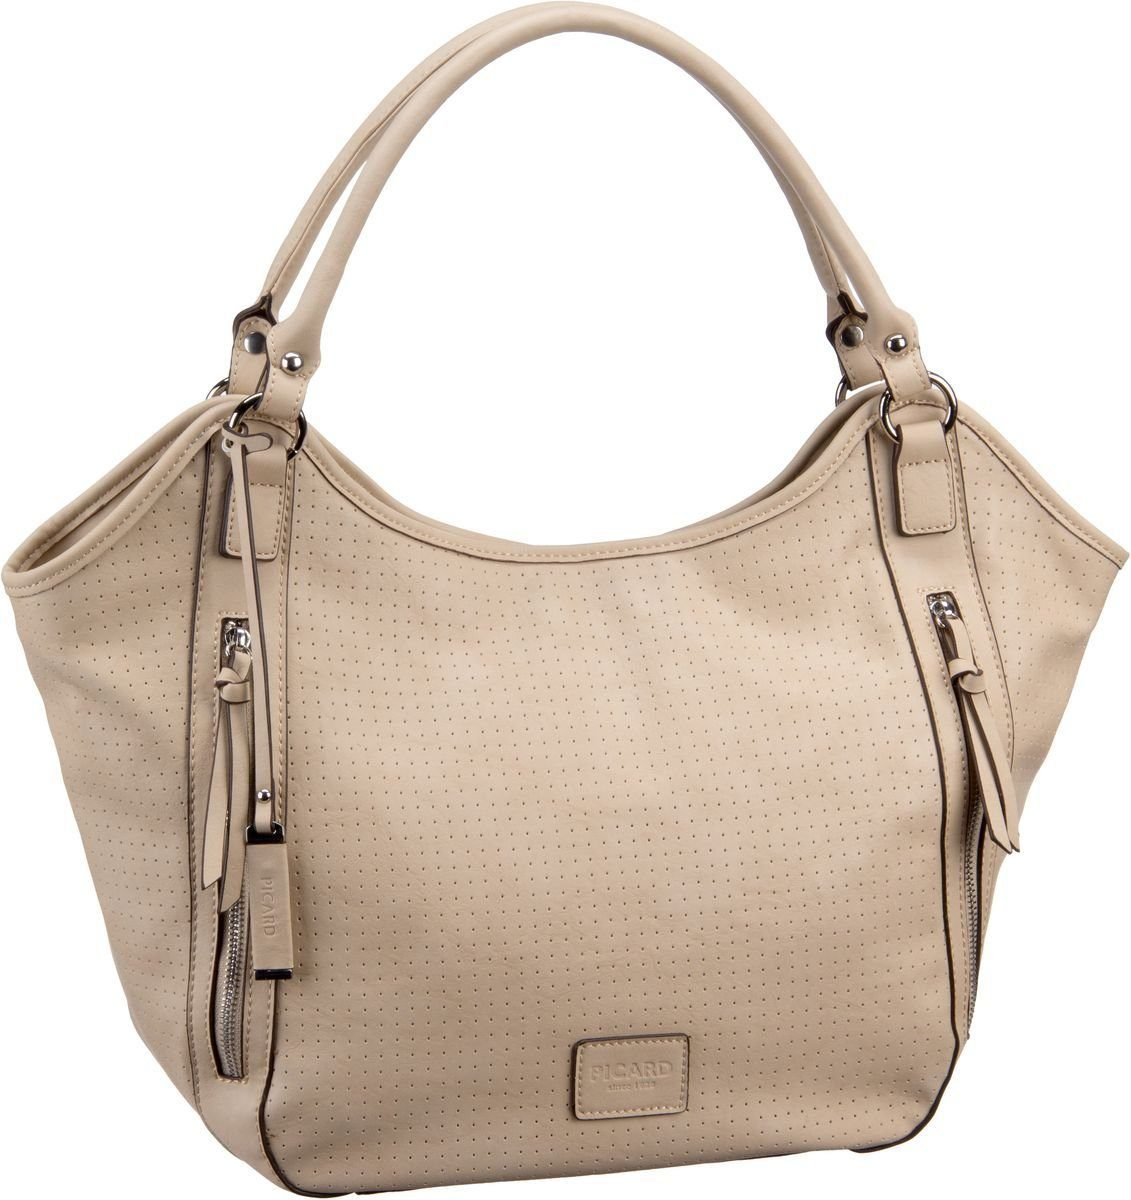 Picard Handtasche »Charming 2420«